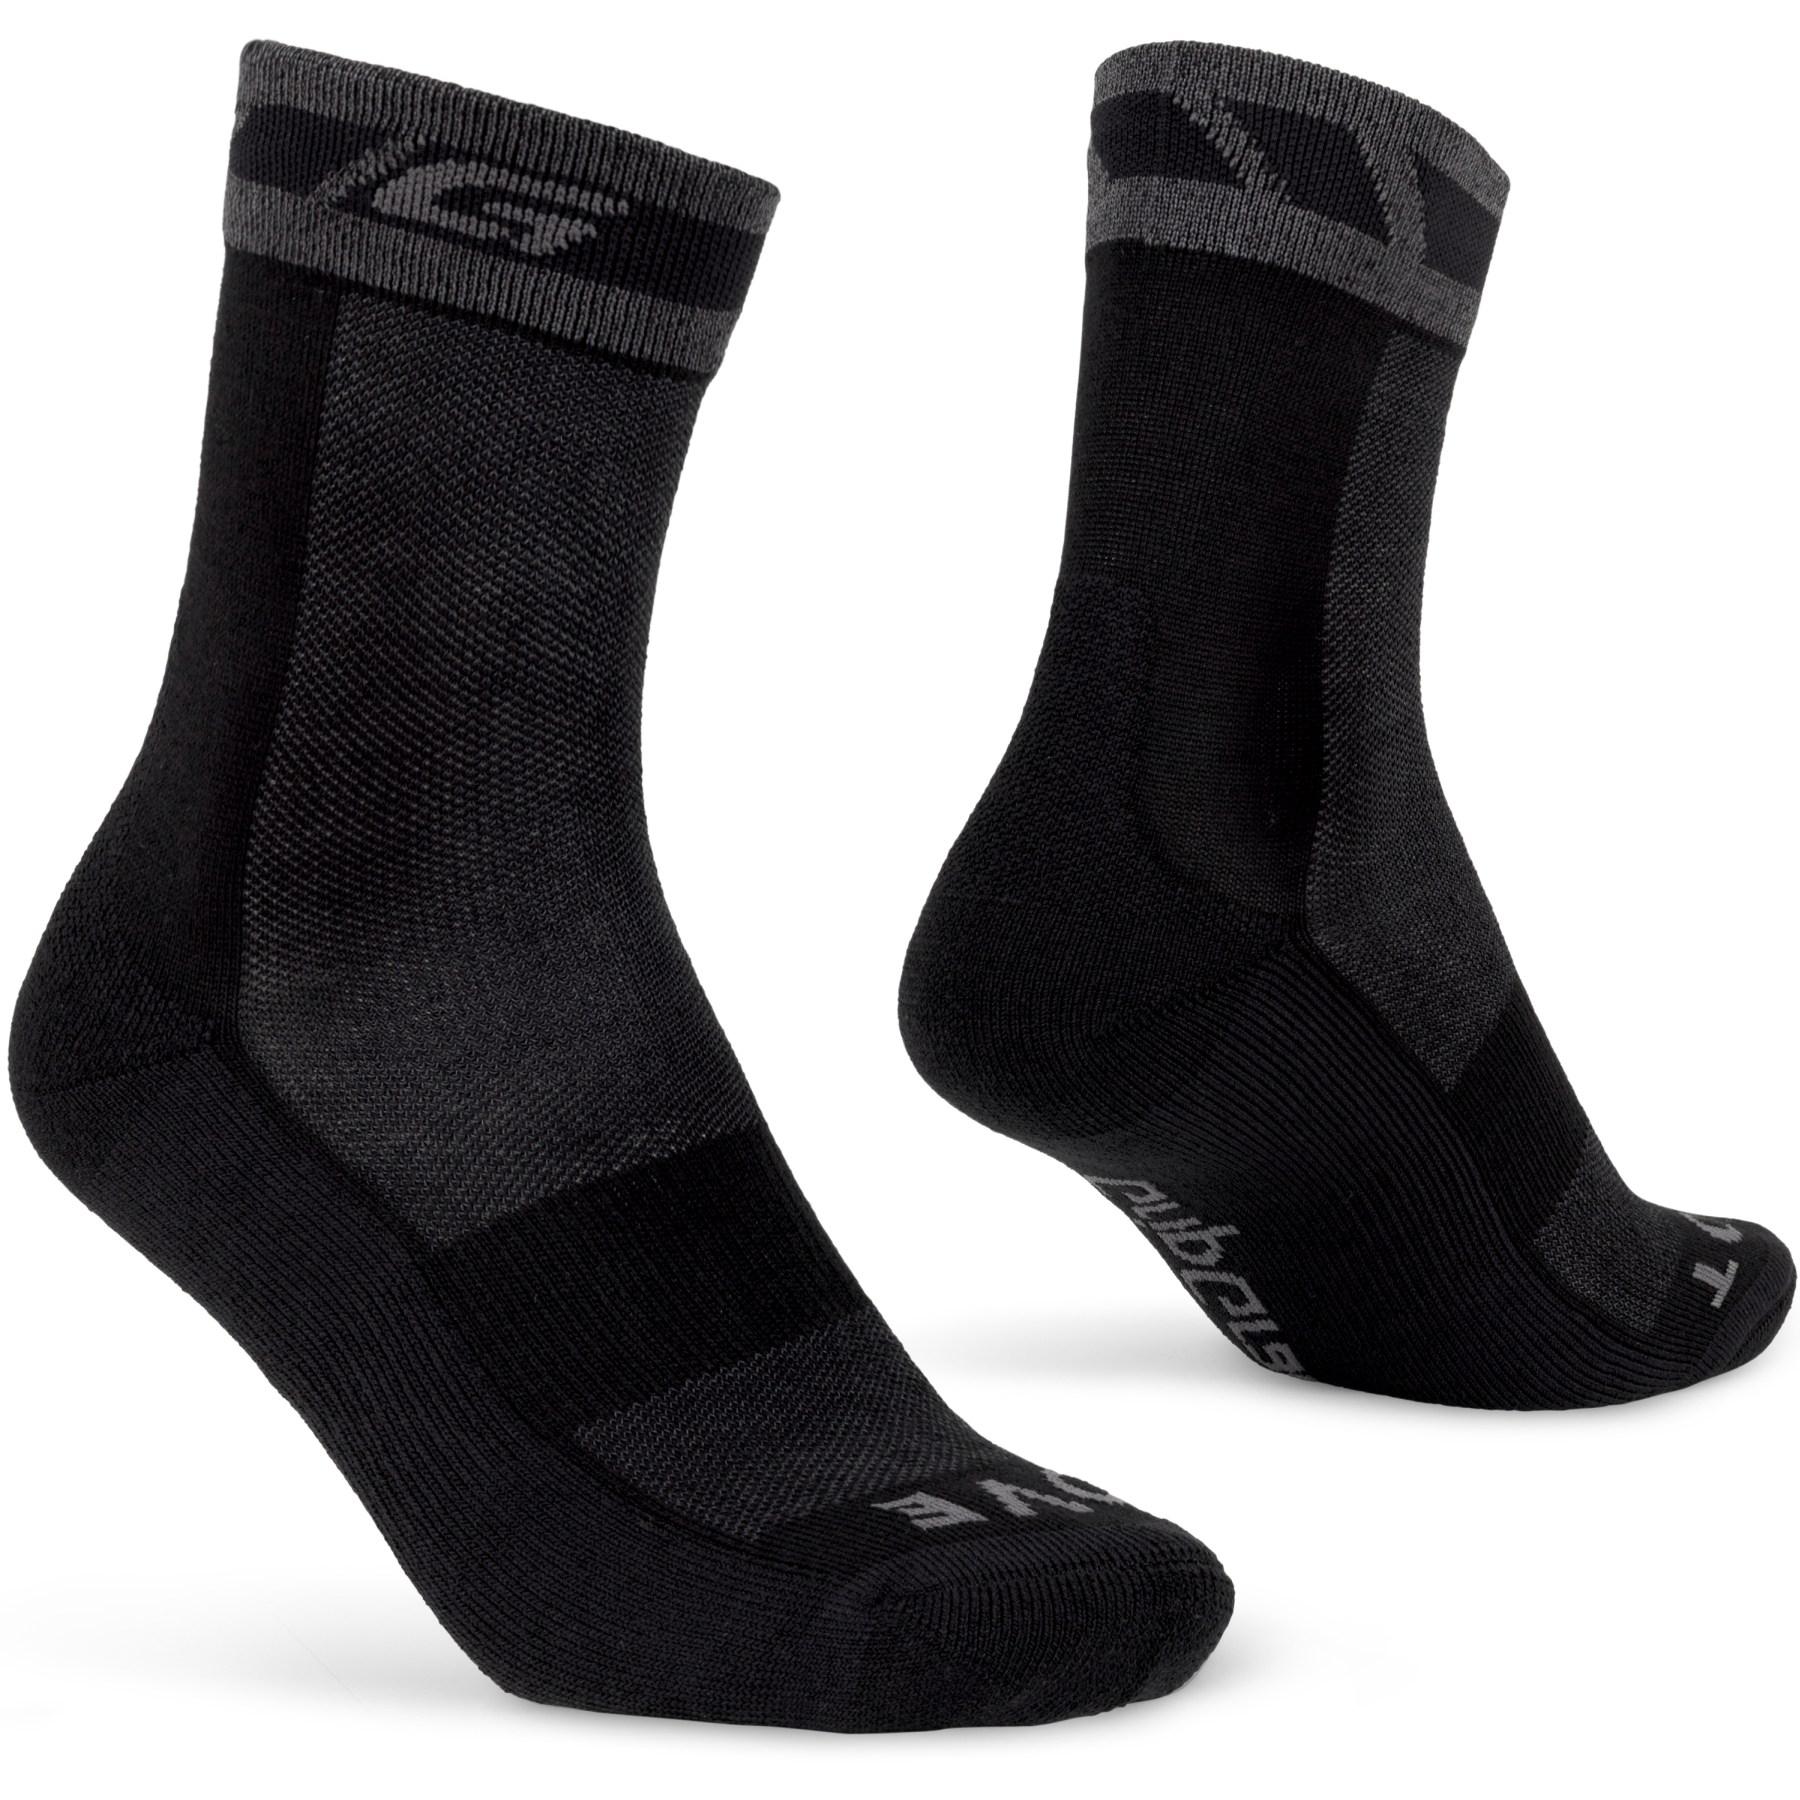 GripGrab Merino Winter Sock - Black